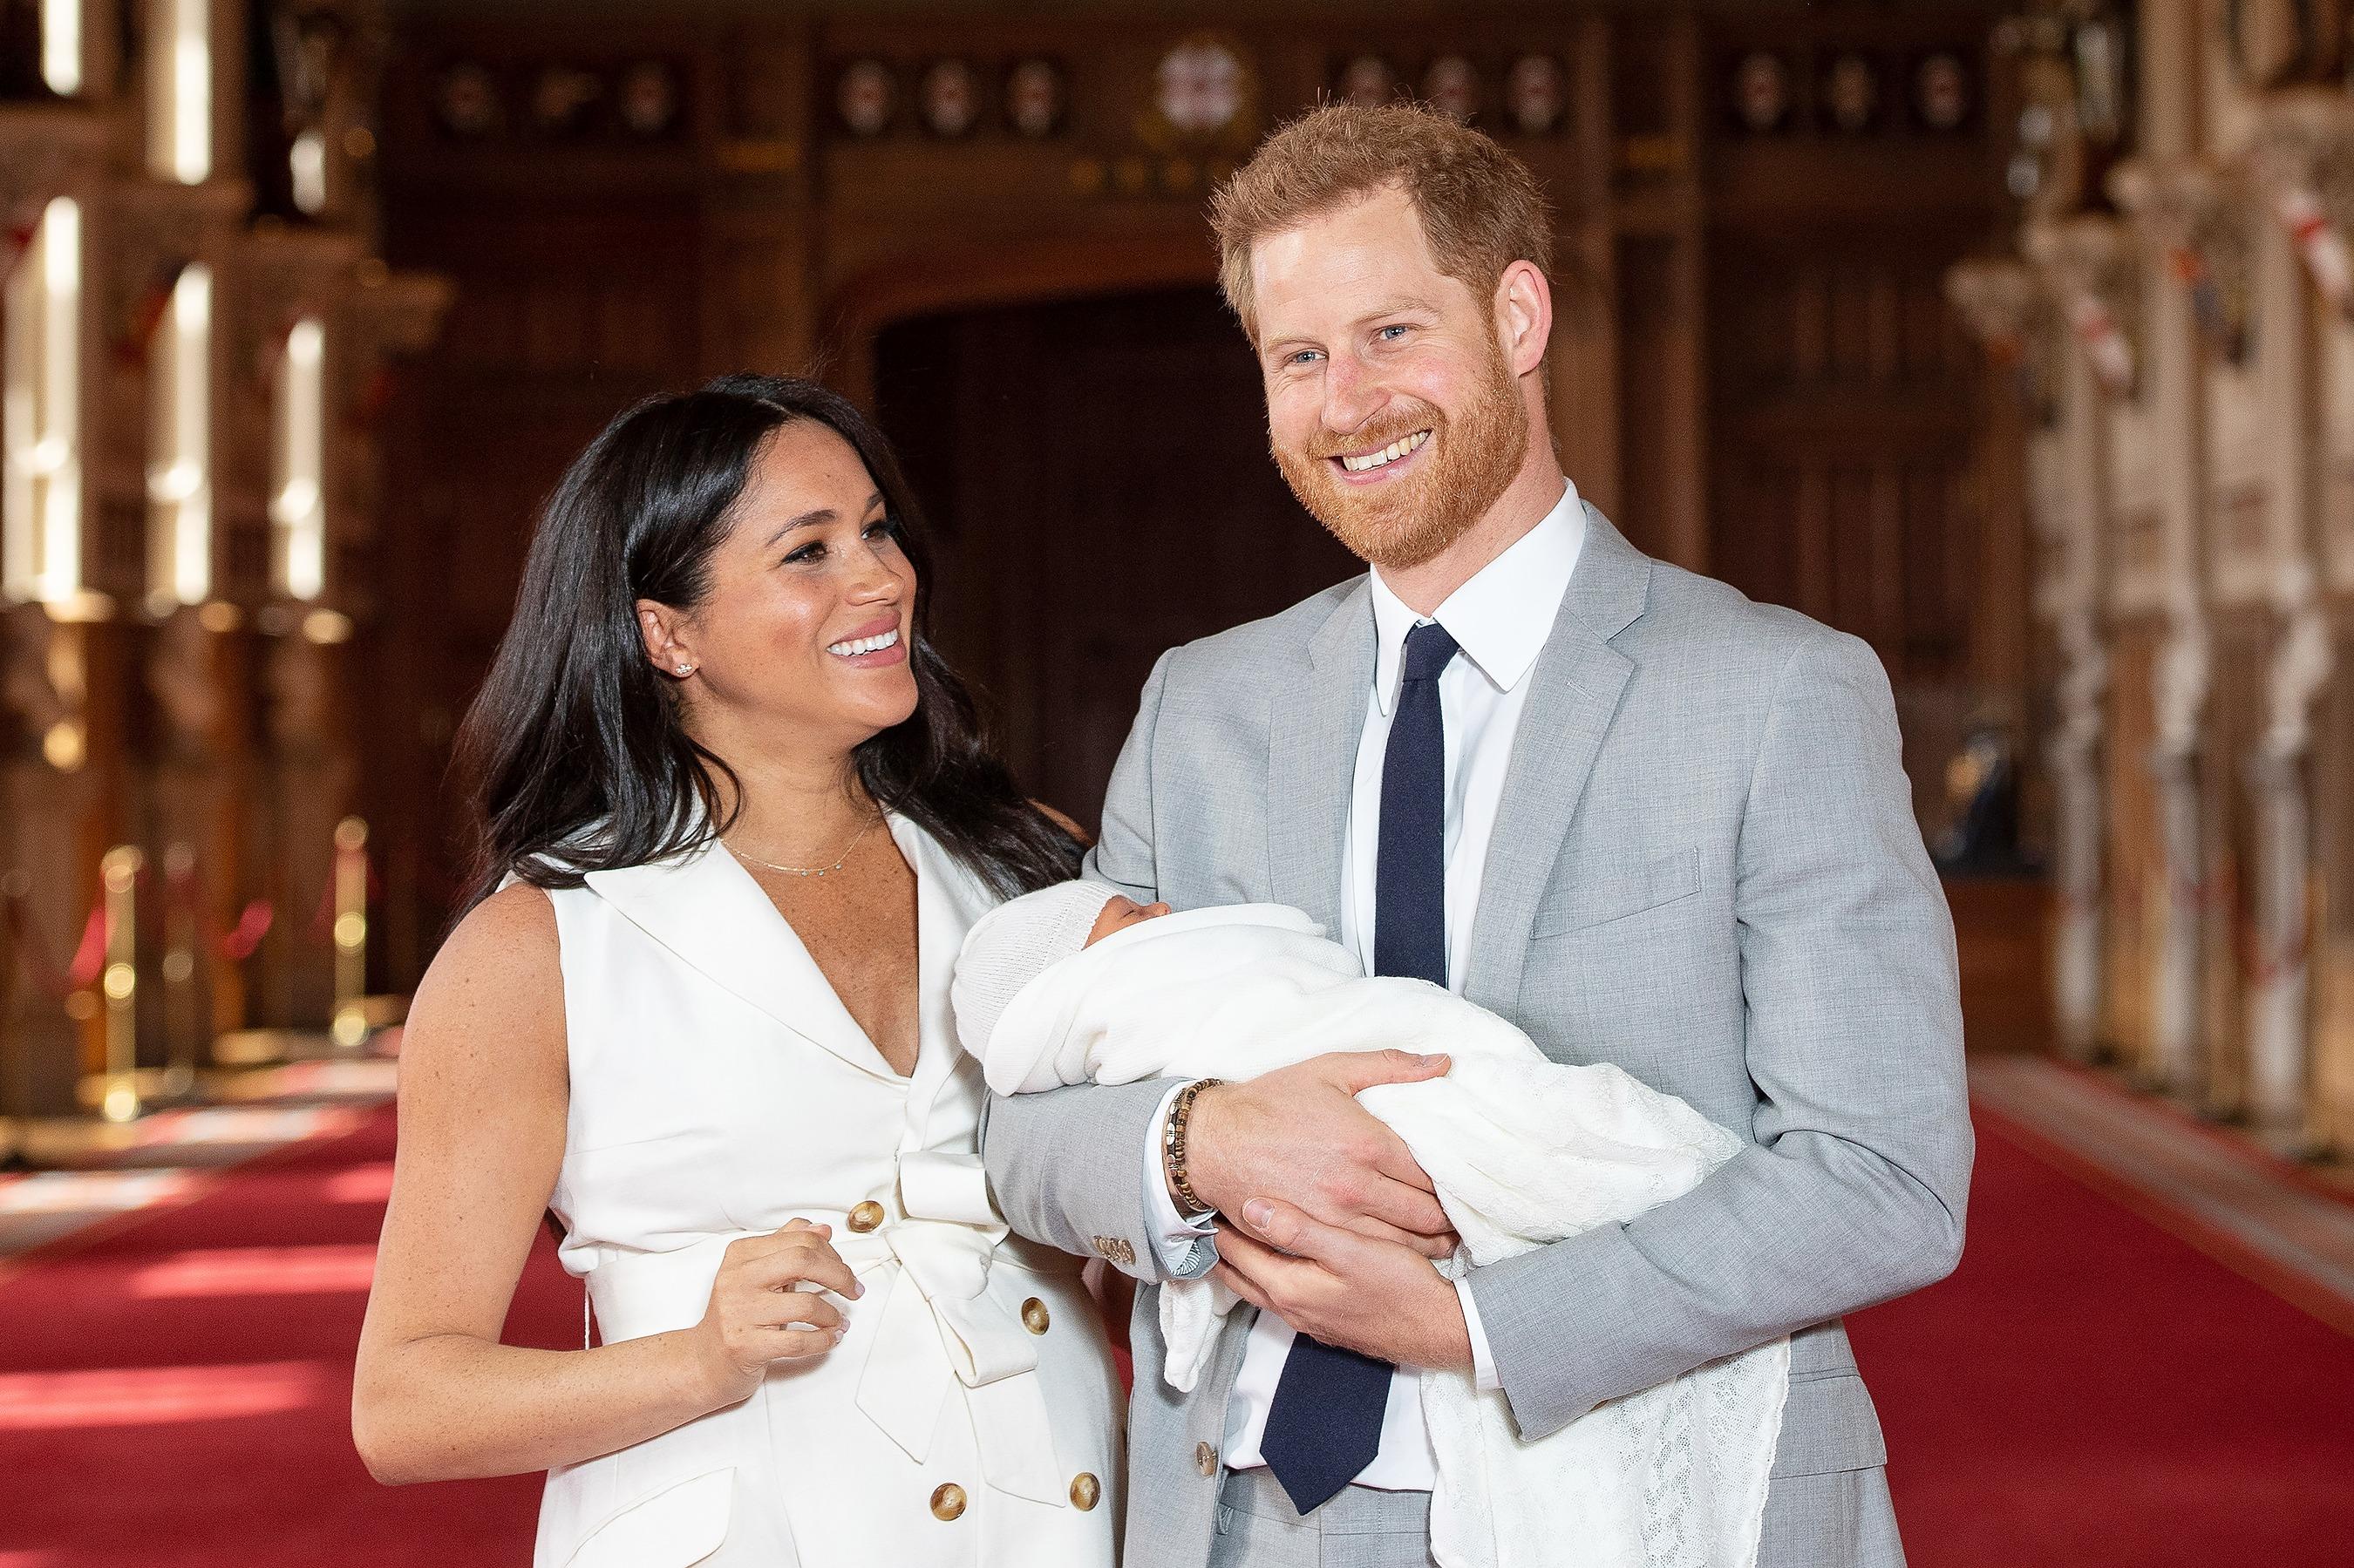 #RoyalGossip Putera Harry dan Meghan Markle 'Dibuang' Istana? Apa Status Mereka? Ini Kronologinya